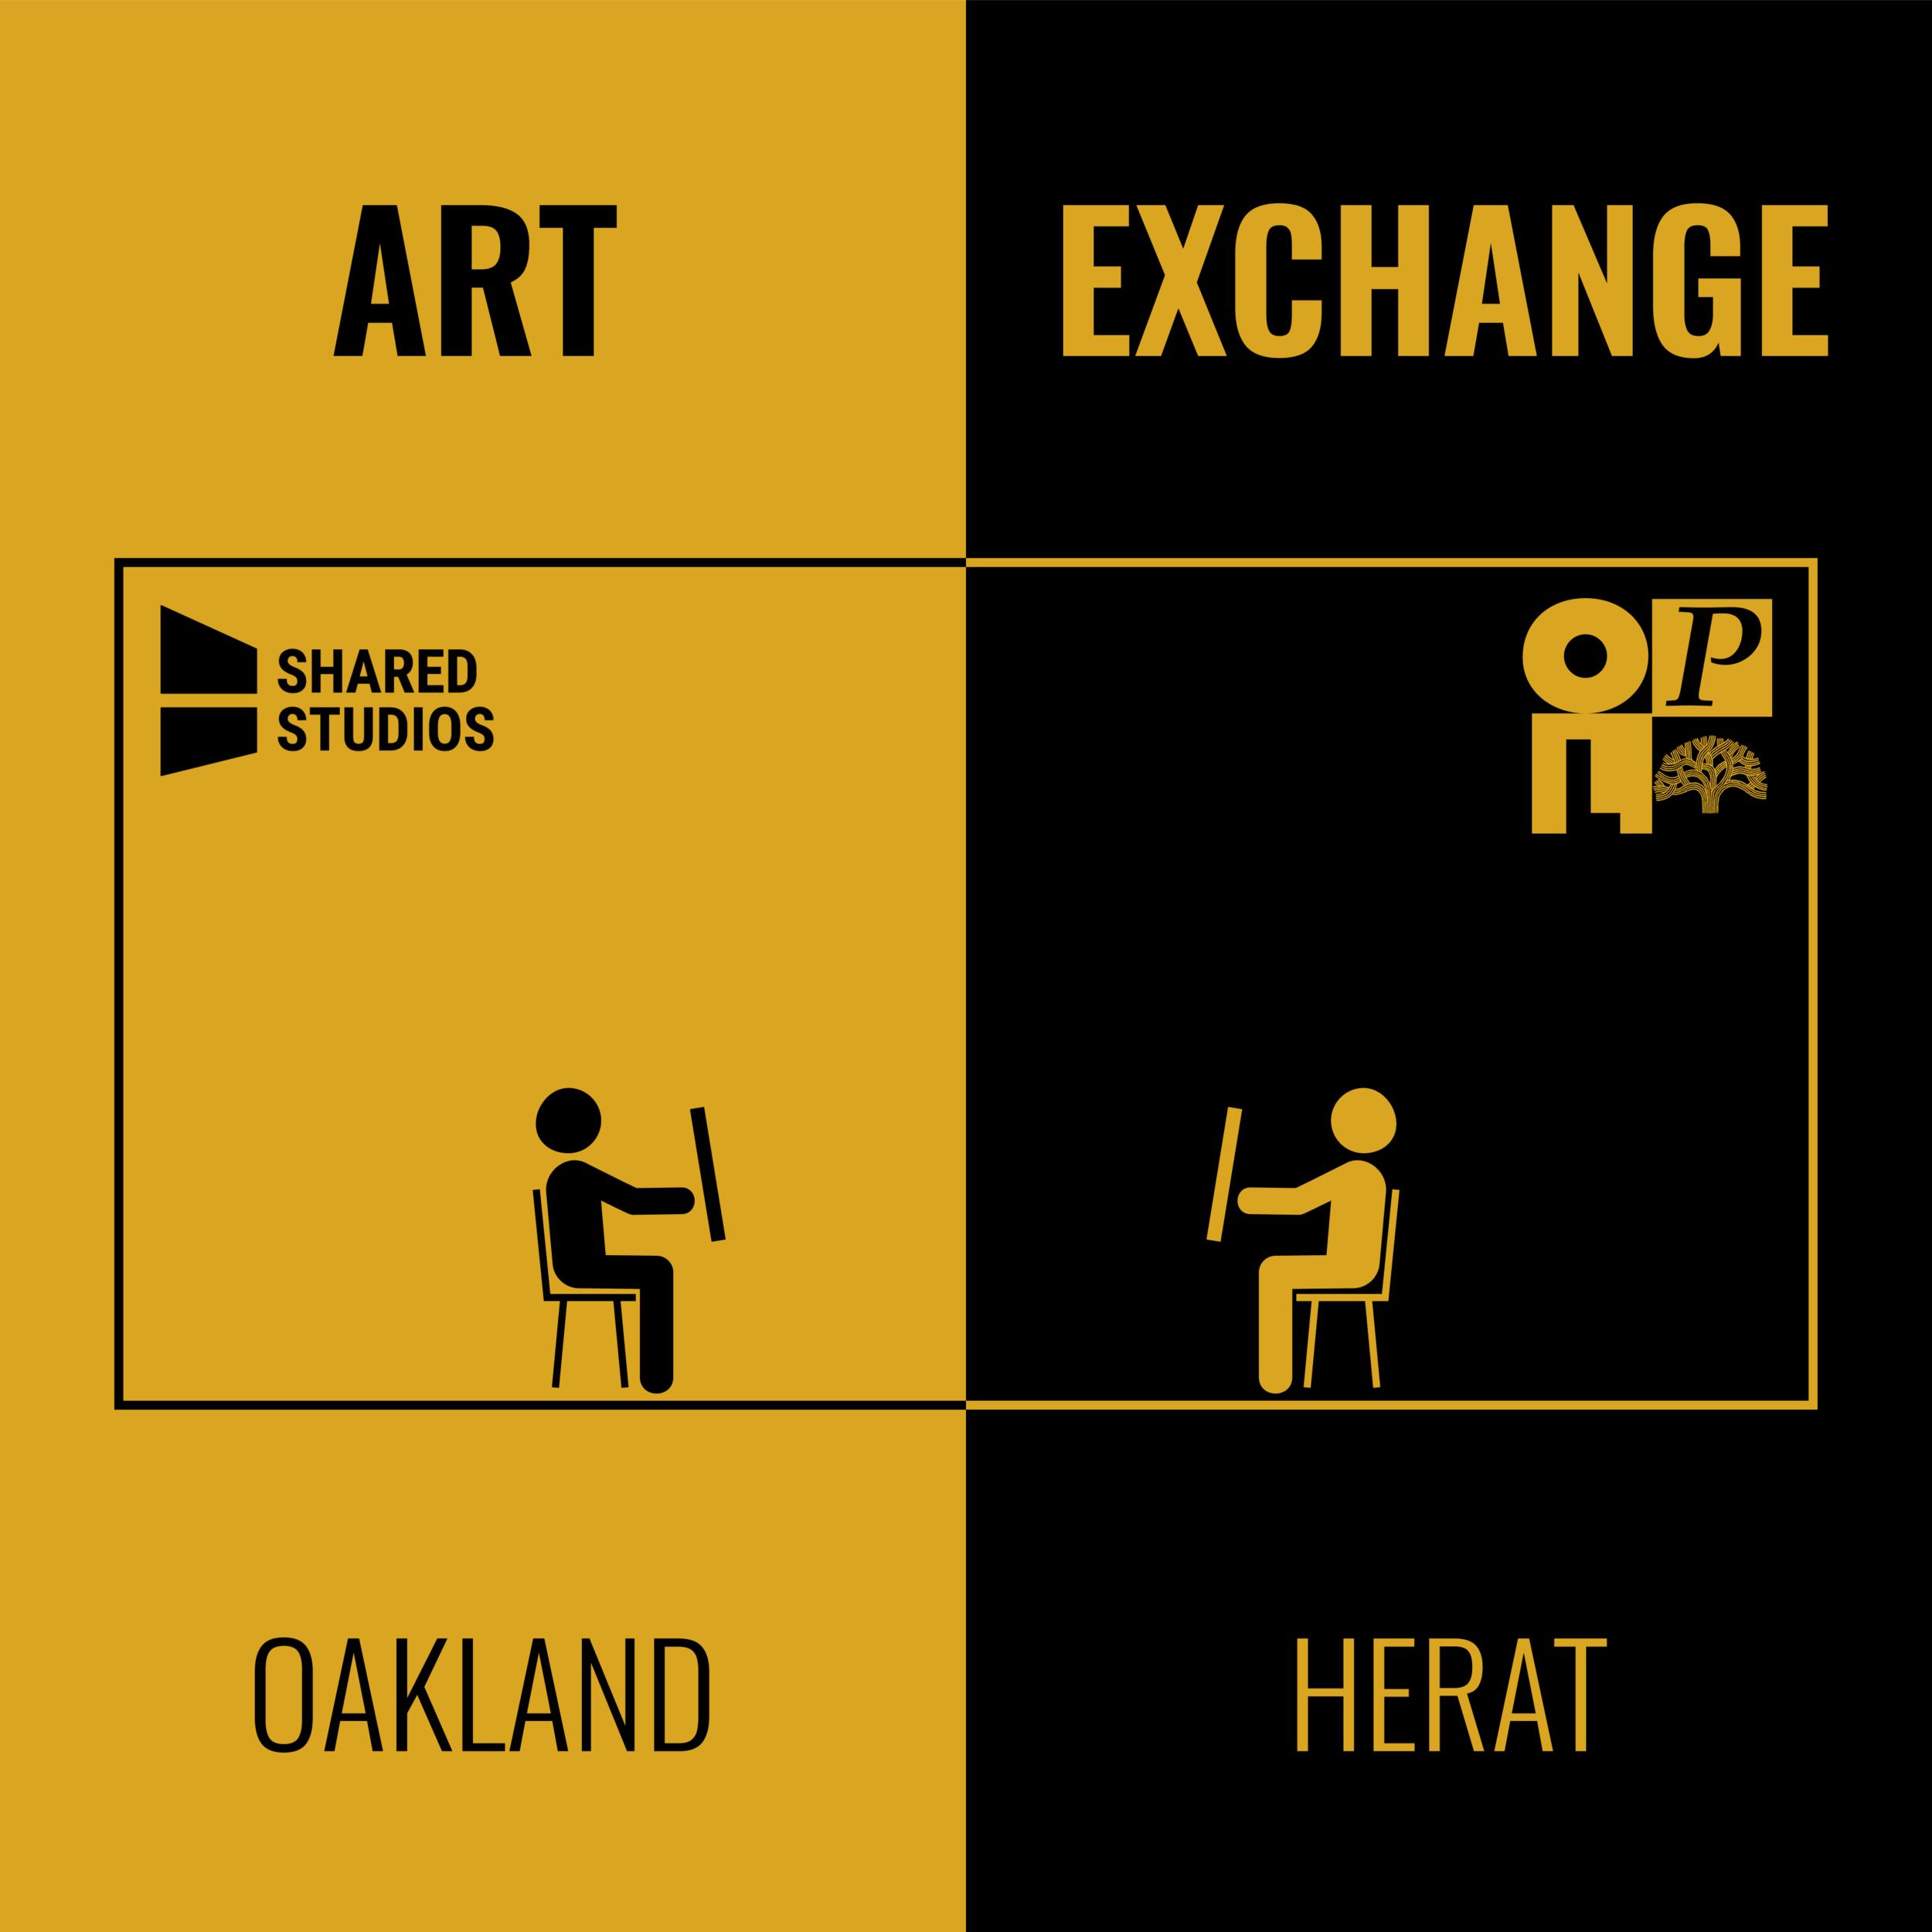 ArtExchange_Insta_English_1.png